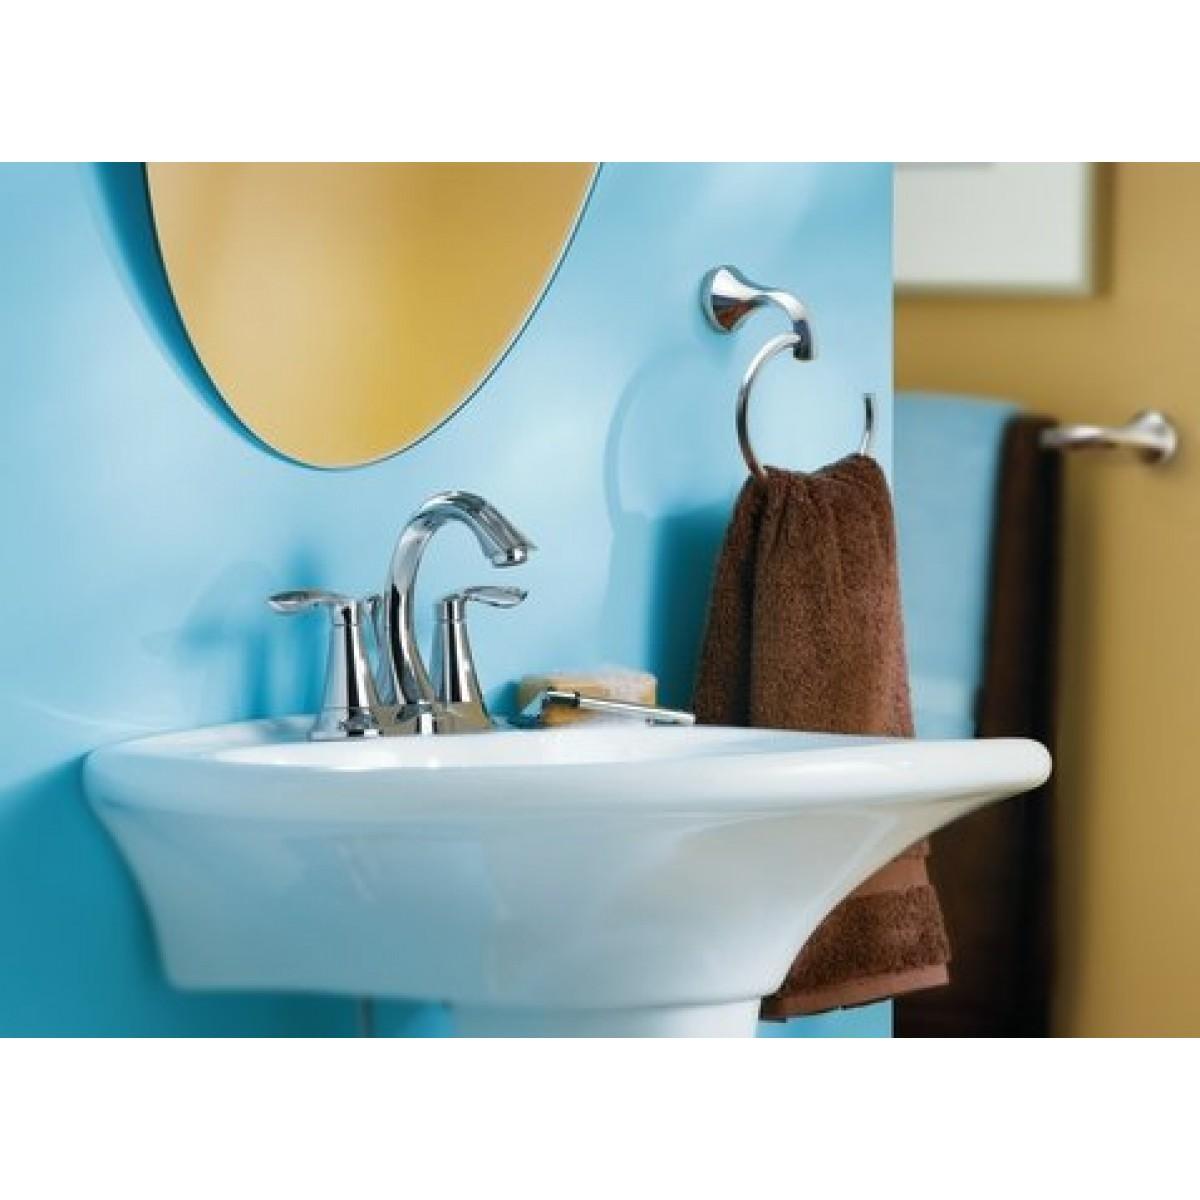 Moen Eva Centerset Lead Free 3 Hole High Arc Bathroom Faucet ...